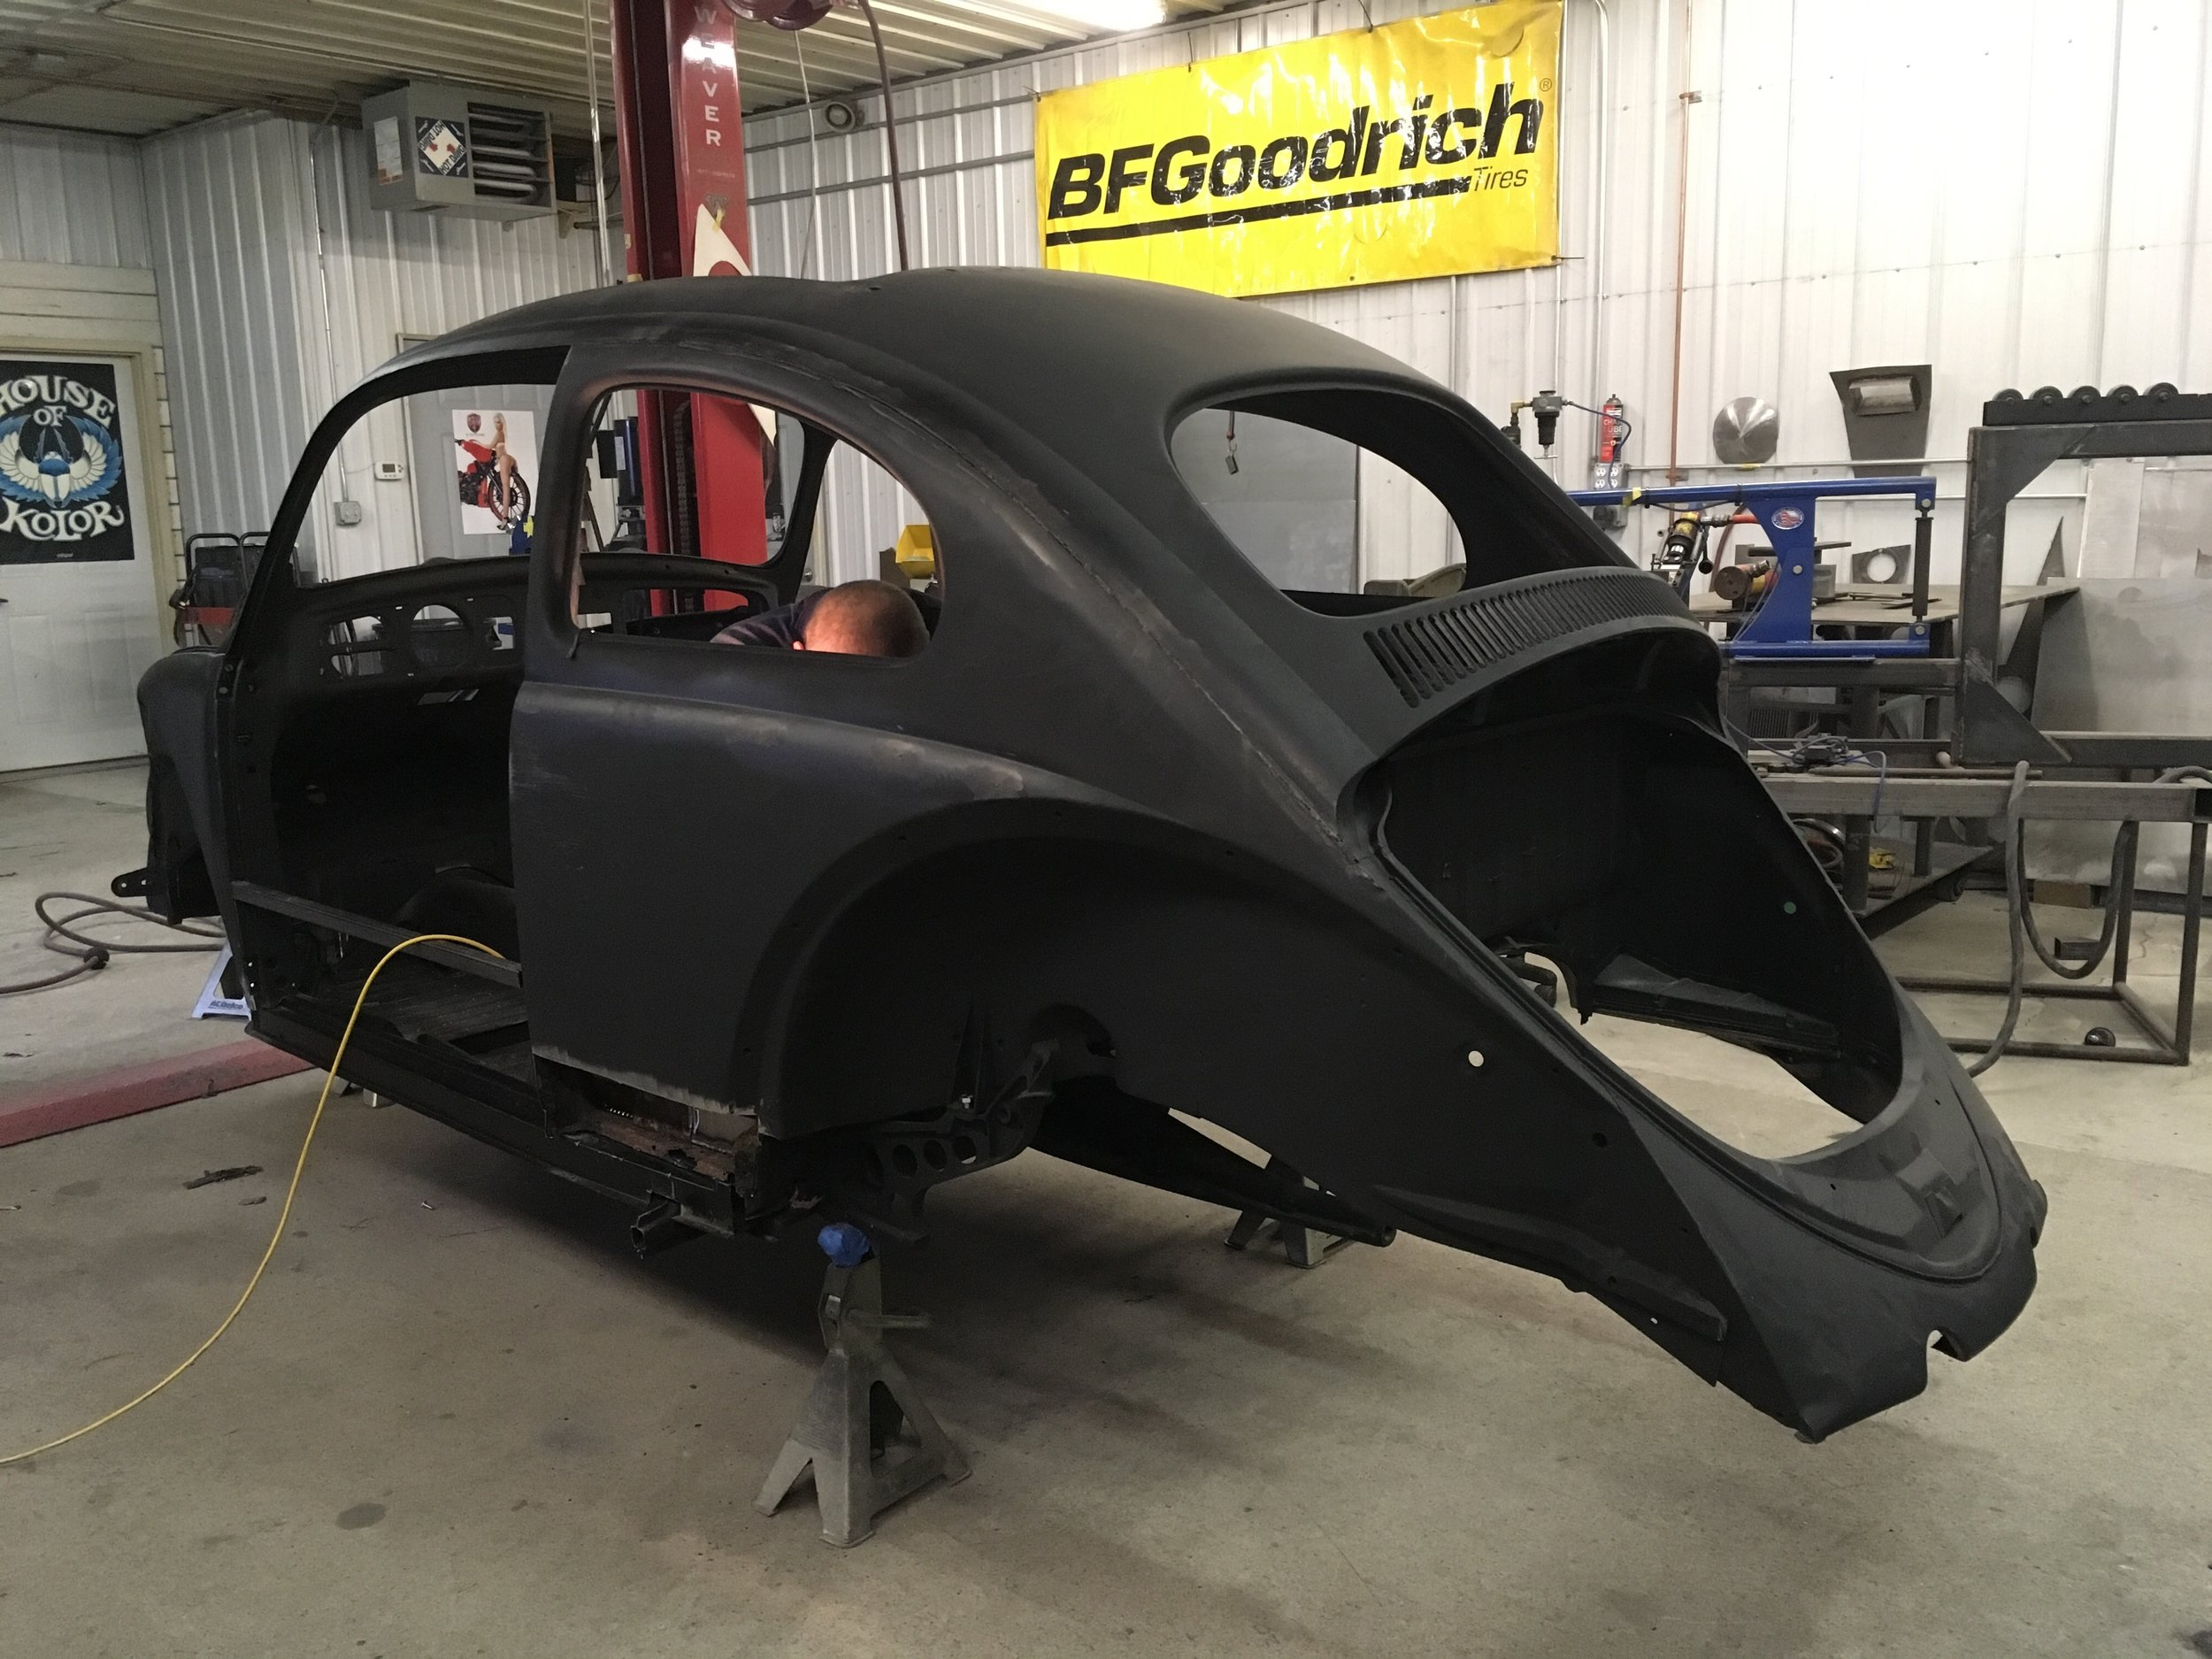 1962-volkswagen-frame-and-body-work-minnesota-hot-rod-factory-vintage-car-restoration.jpg